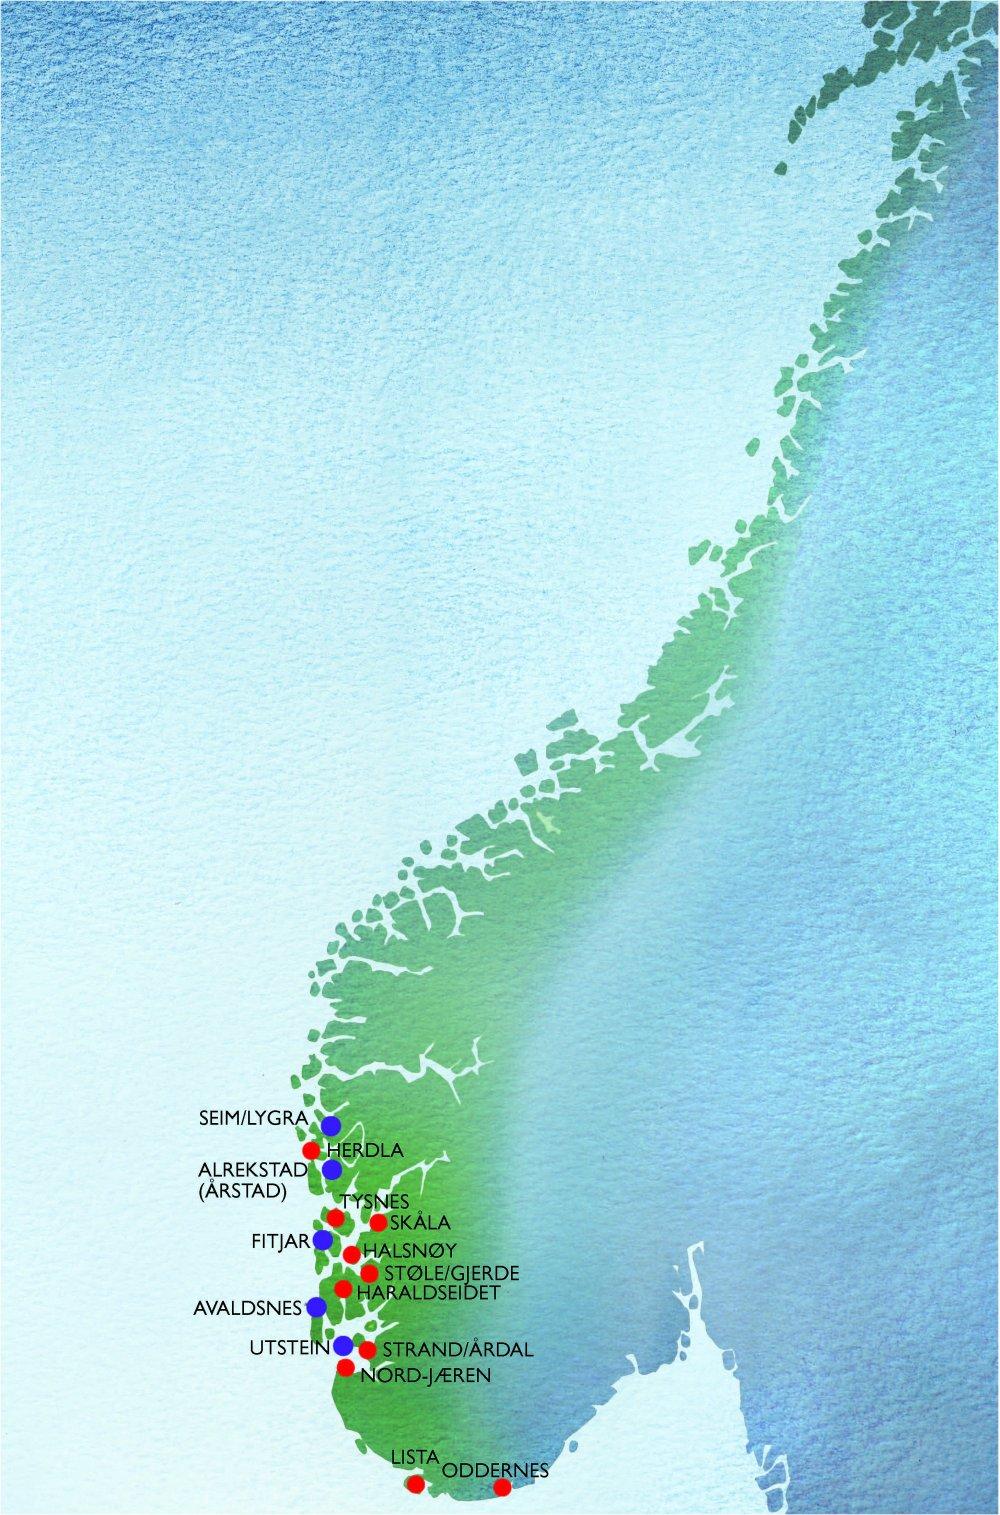 kart hafrsfjord Harald Hårfagre Harald Fairhair kart hafrsfjord